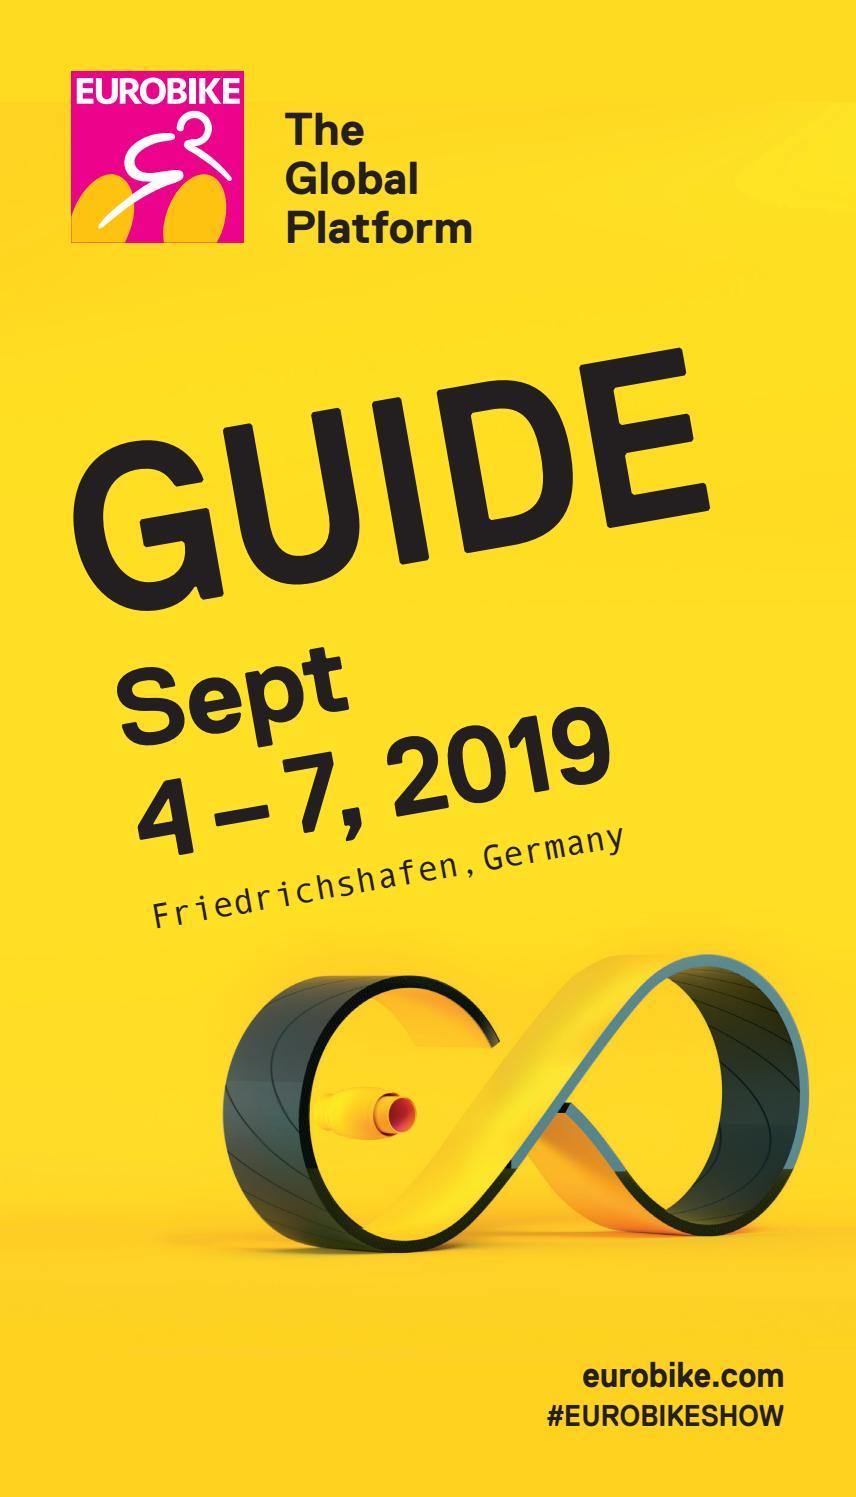 EUROBIKE 2019 | GUIDE by Messe Friedrichshafen GmbH - issuu